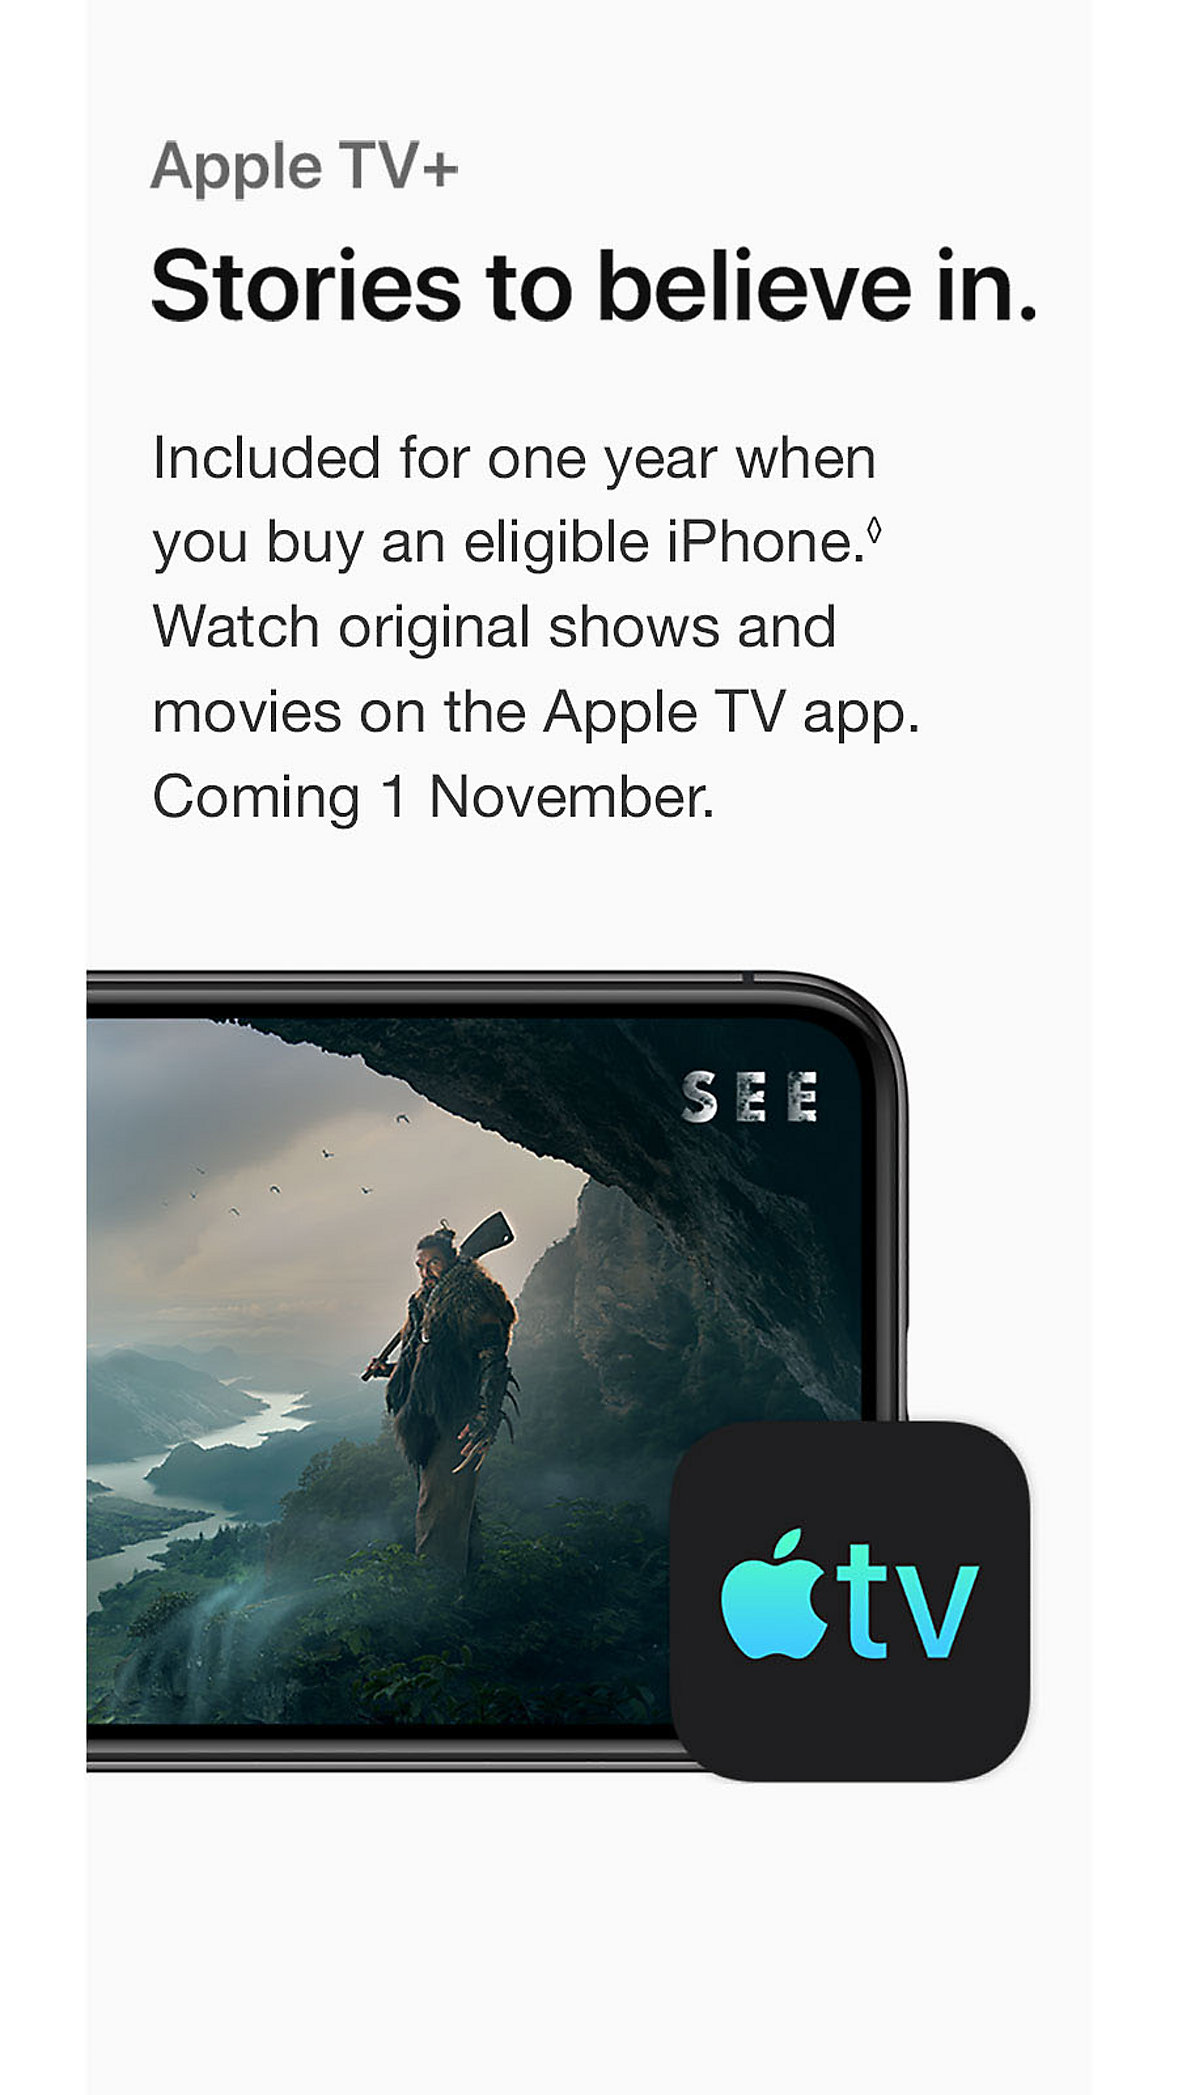 iPhone Apple TV+ Promotion